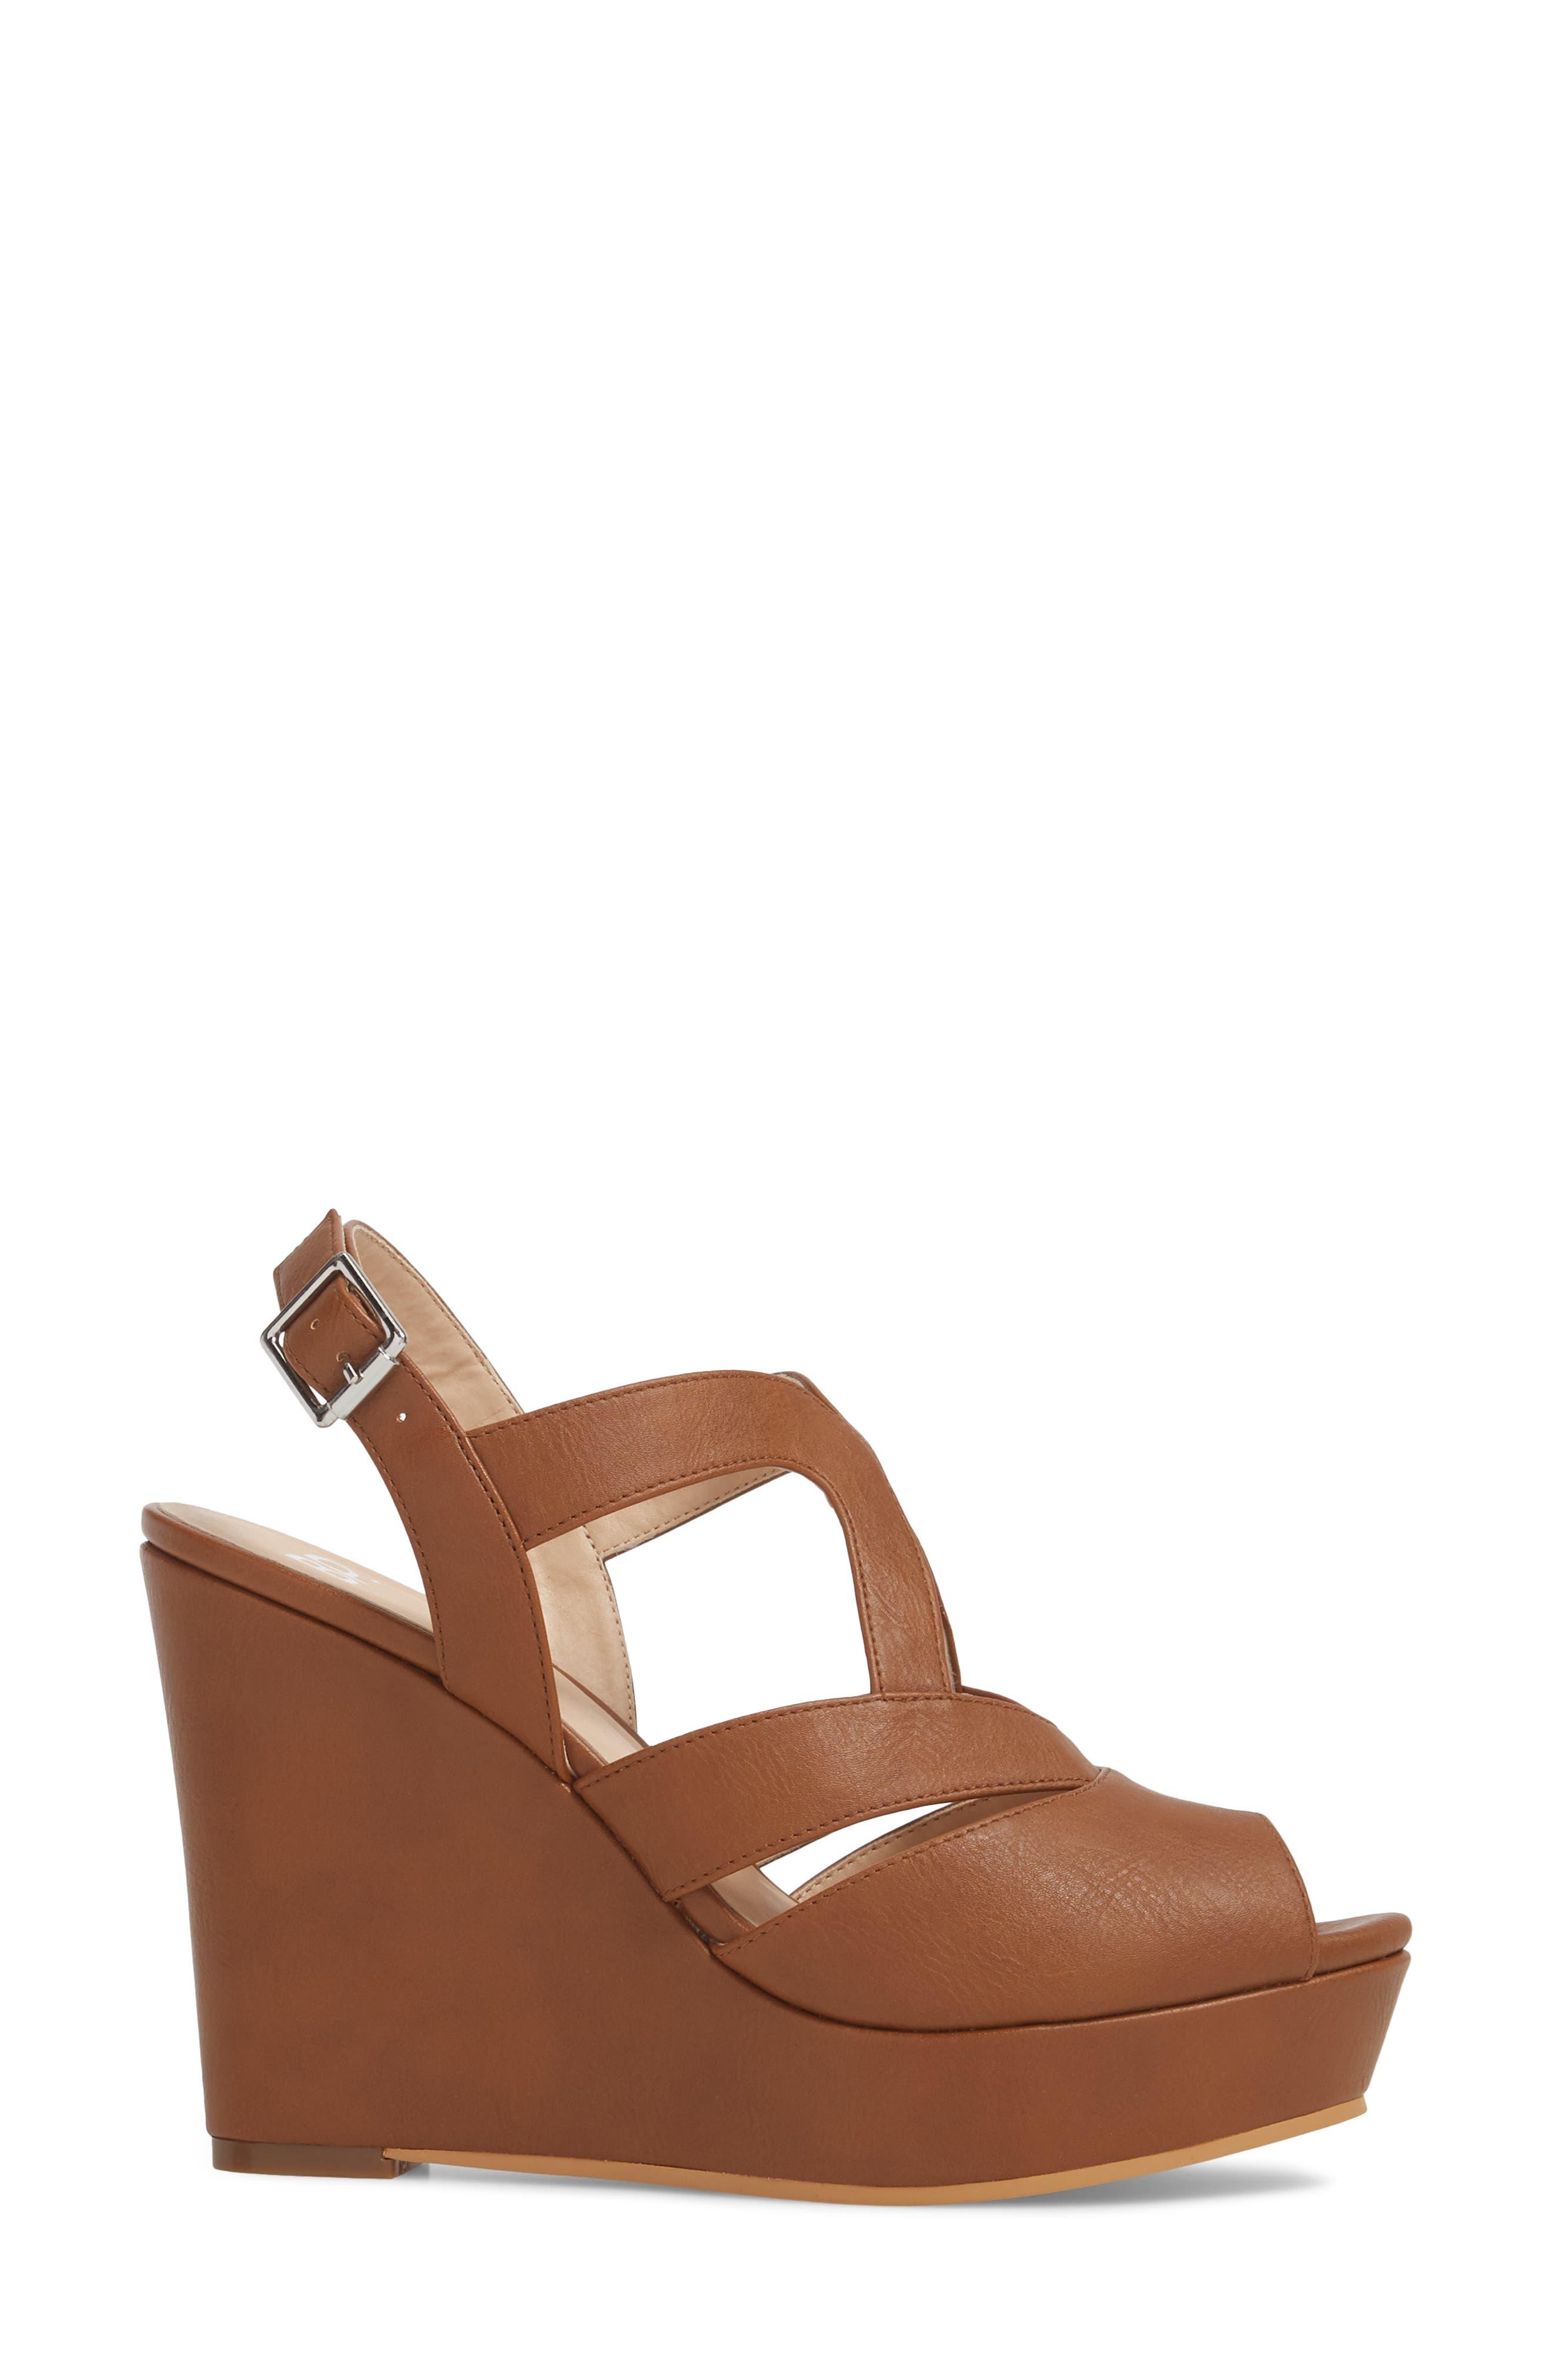 Sunny Platform Wedge Sandal,                             Alternate thumbnail 16, color,